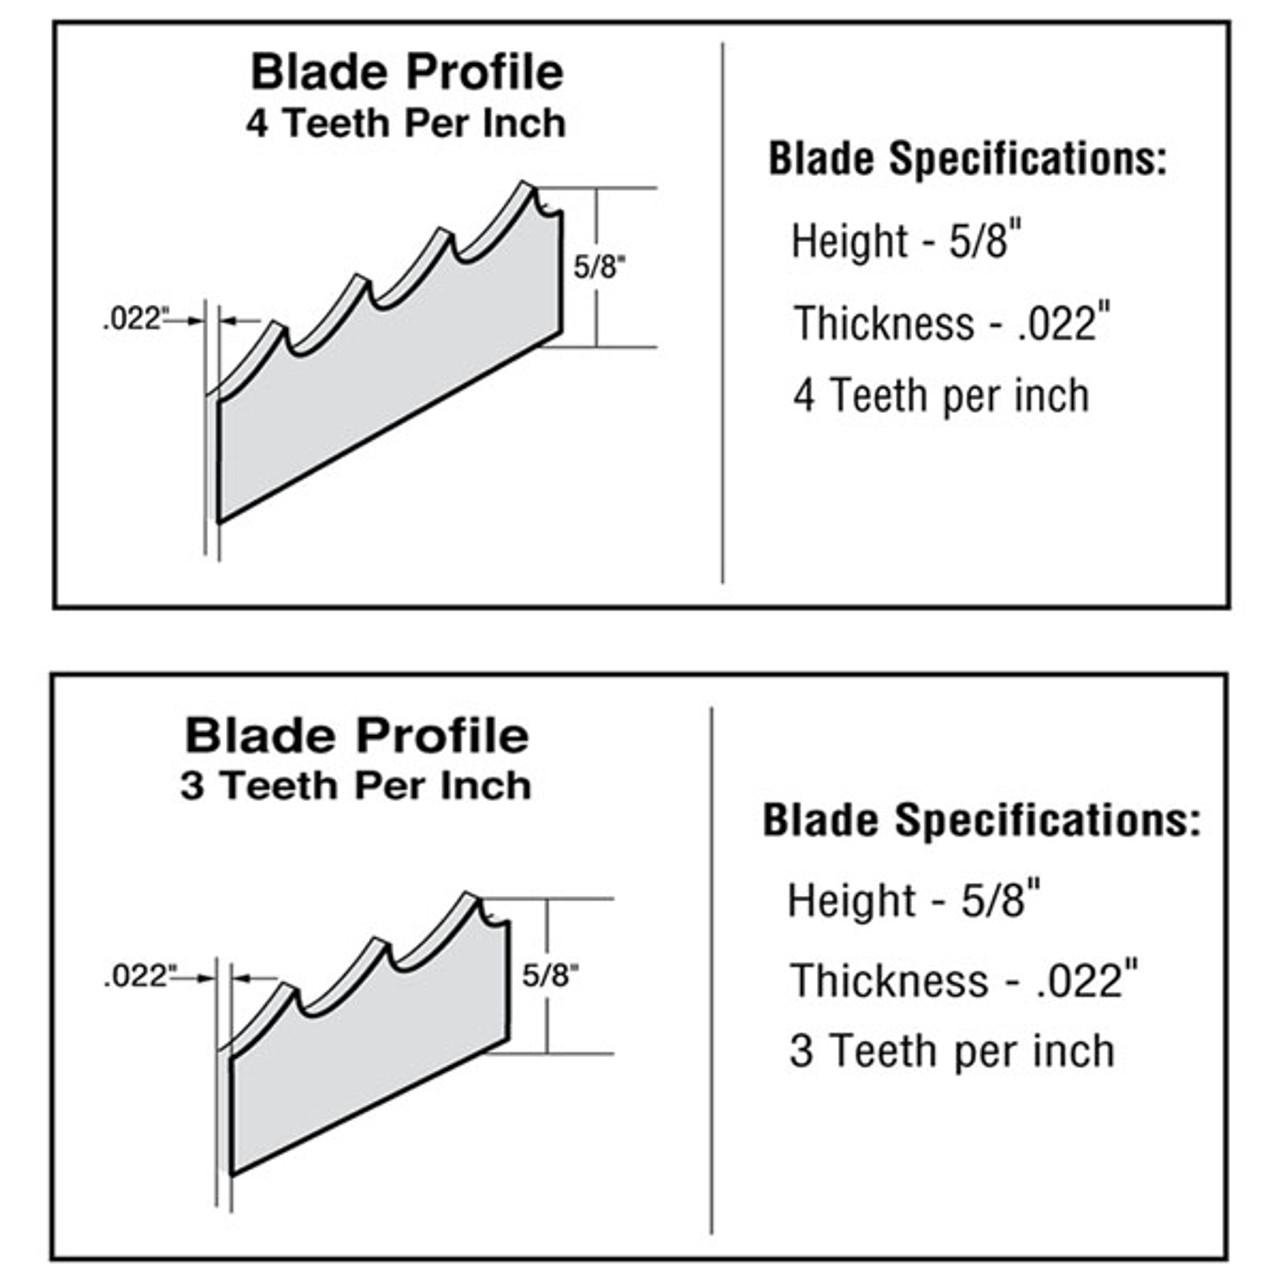 116'' Meat Band Saw Blades - ProCut KSP-116, KS-116 - Tor-Rey ST-295PE, ST-295AI - Biro 33 - Hudson 116